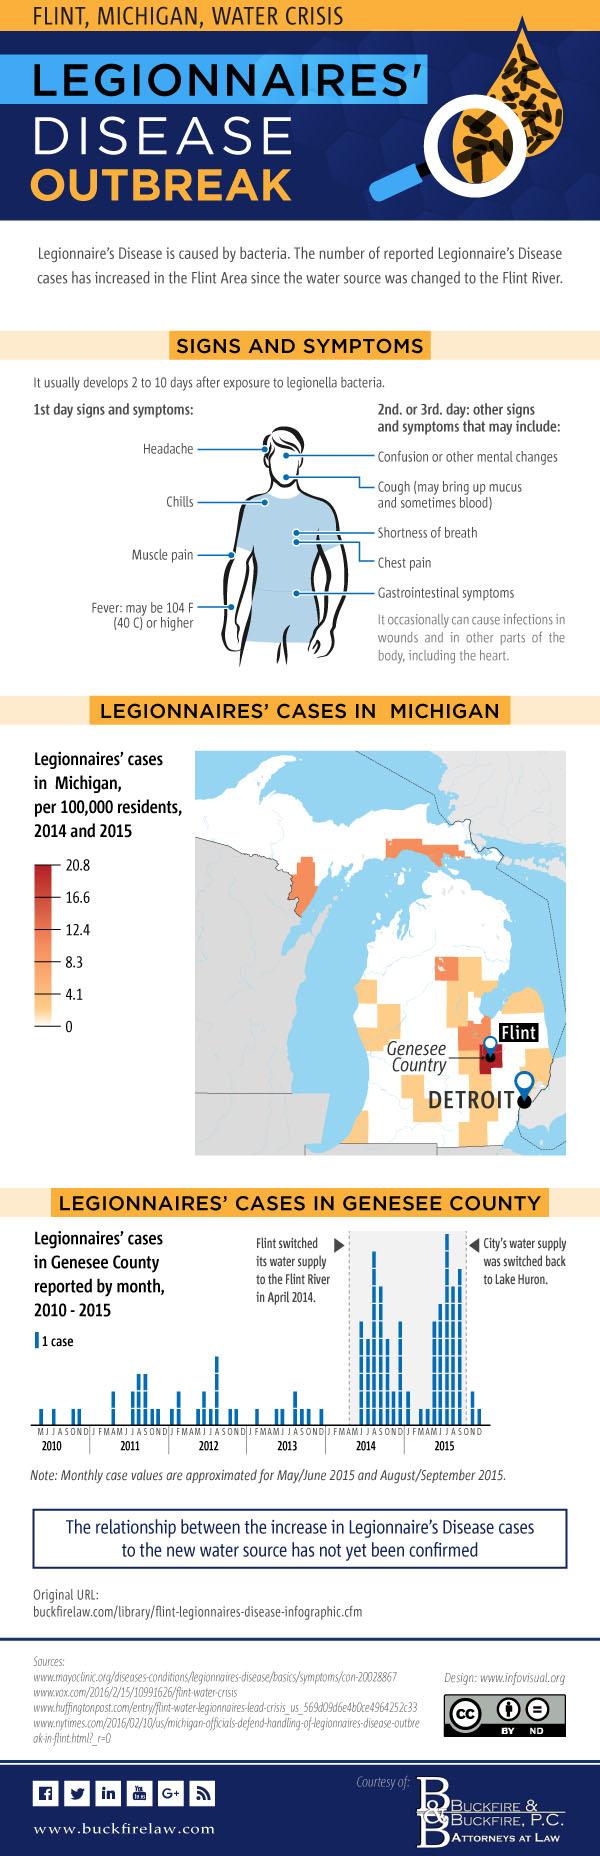 flint legionnaires' disease outbreak infographic